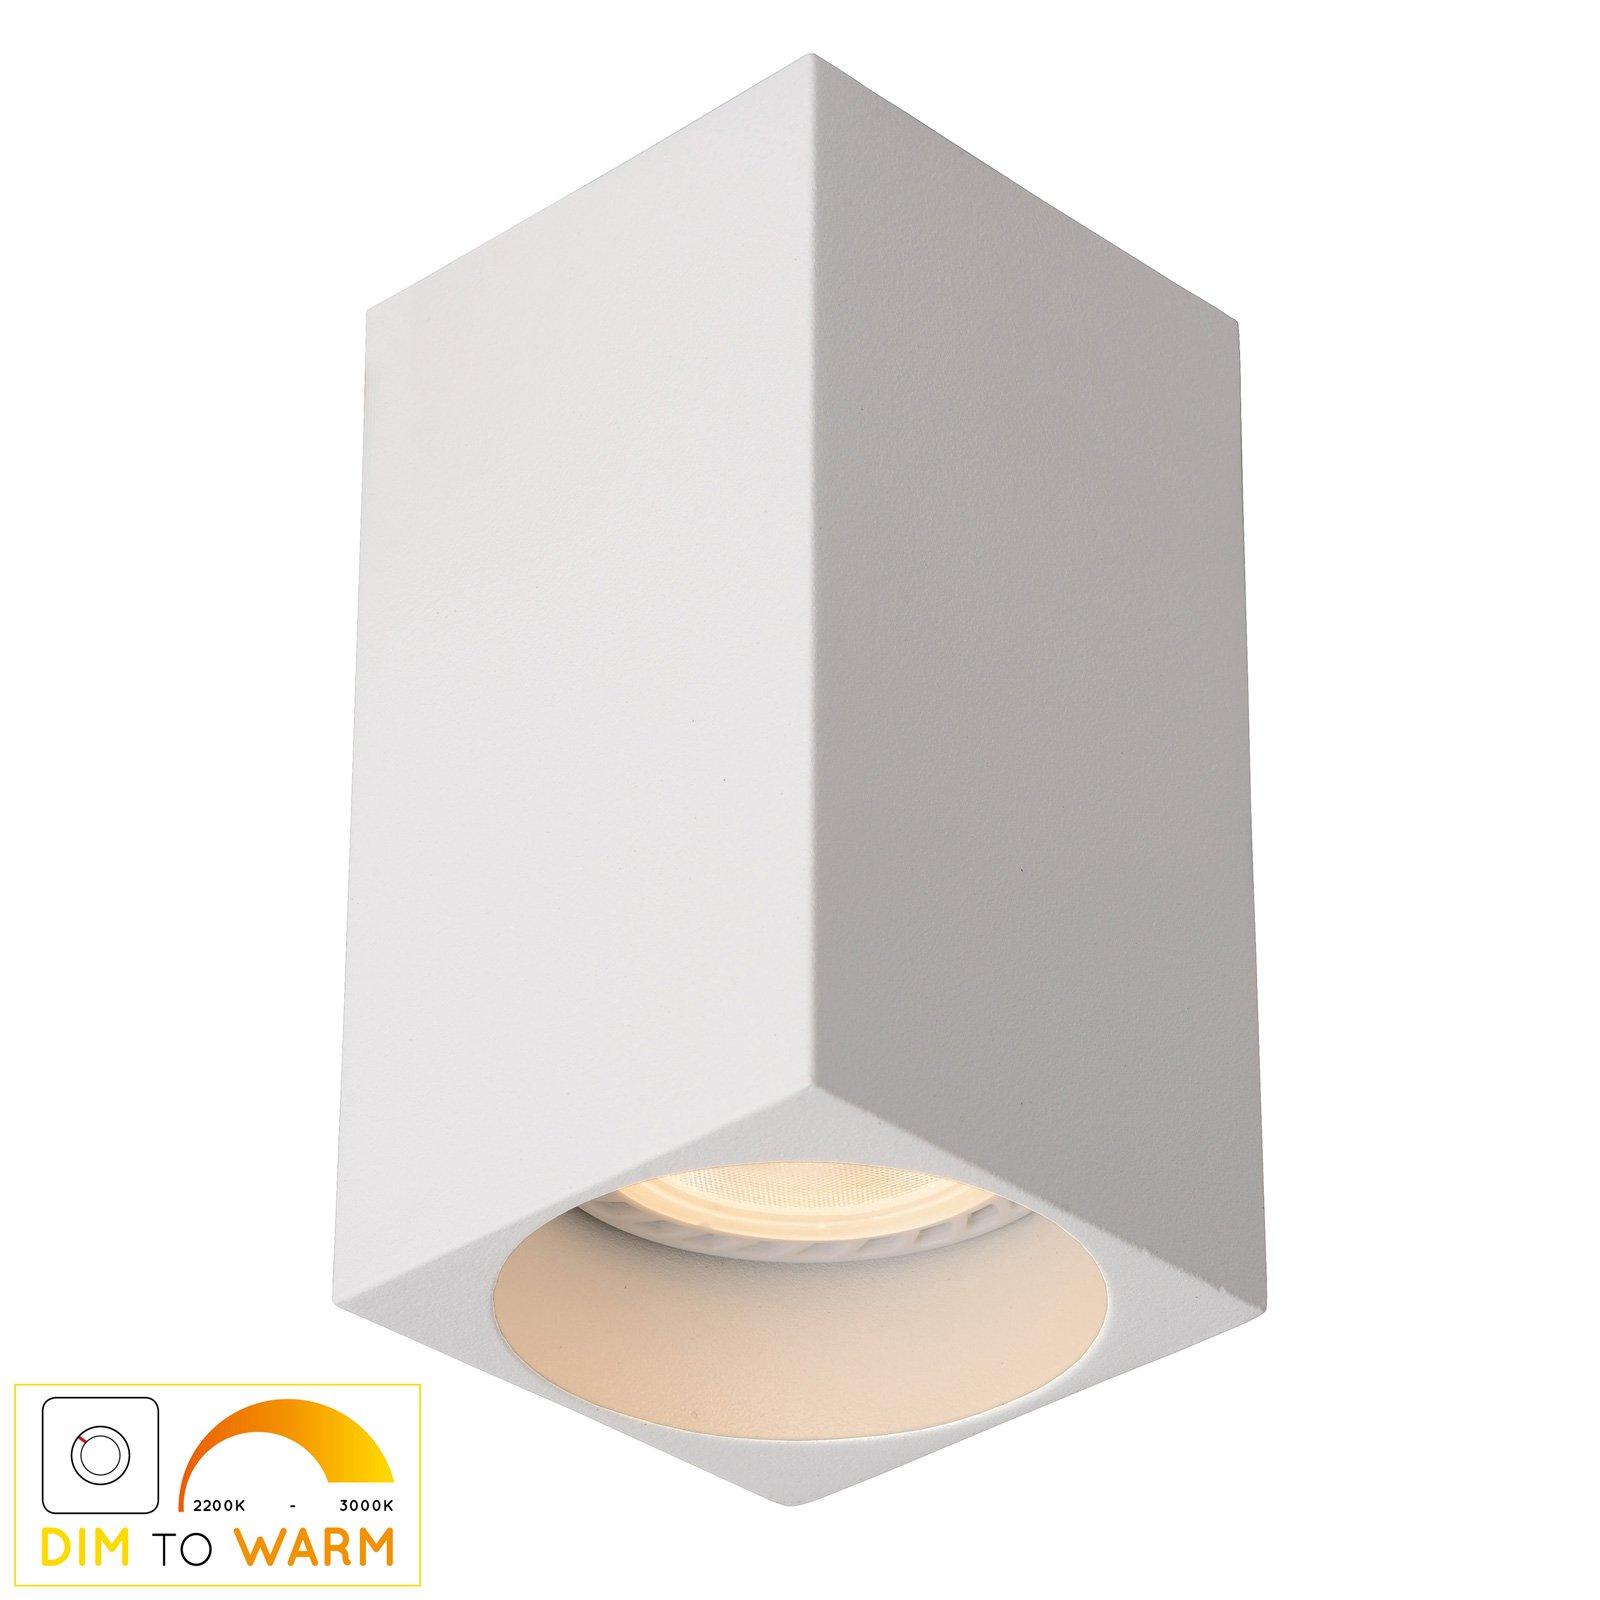 Delto LED-taklampe dim to warm, kantet, hvit